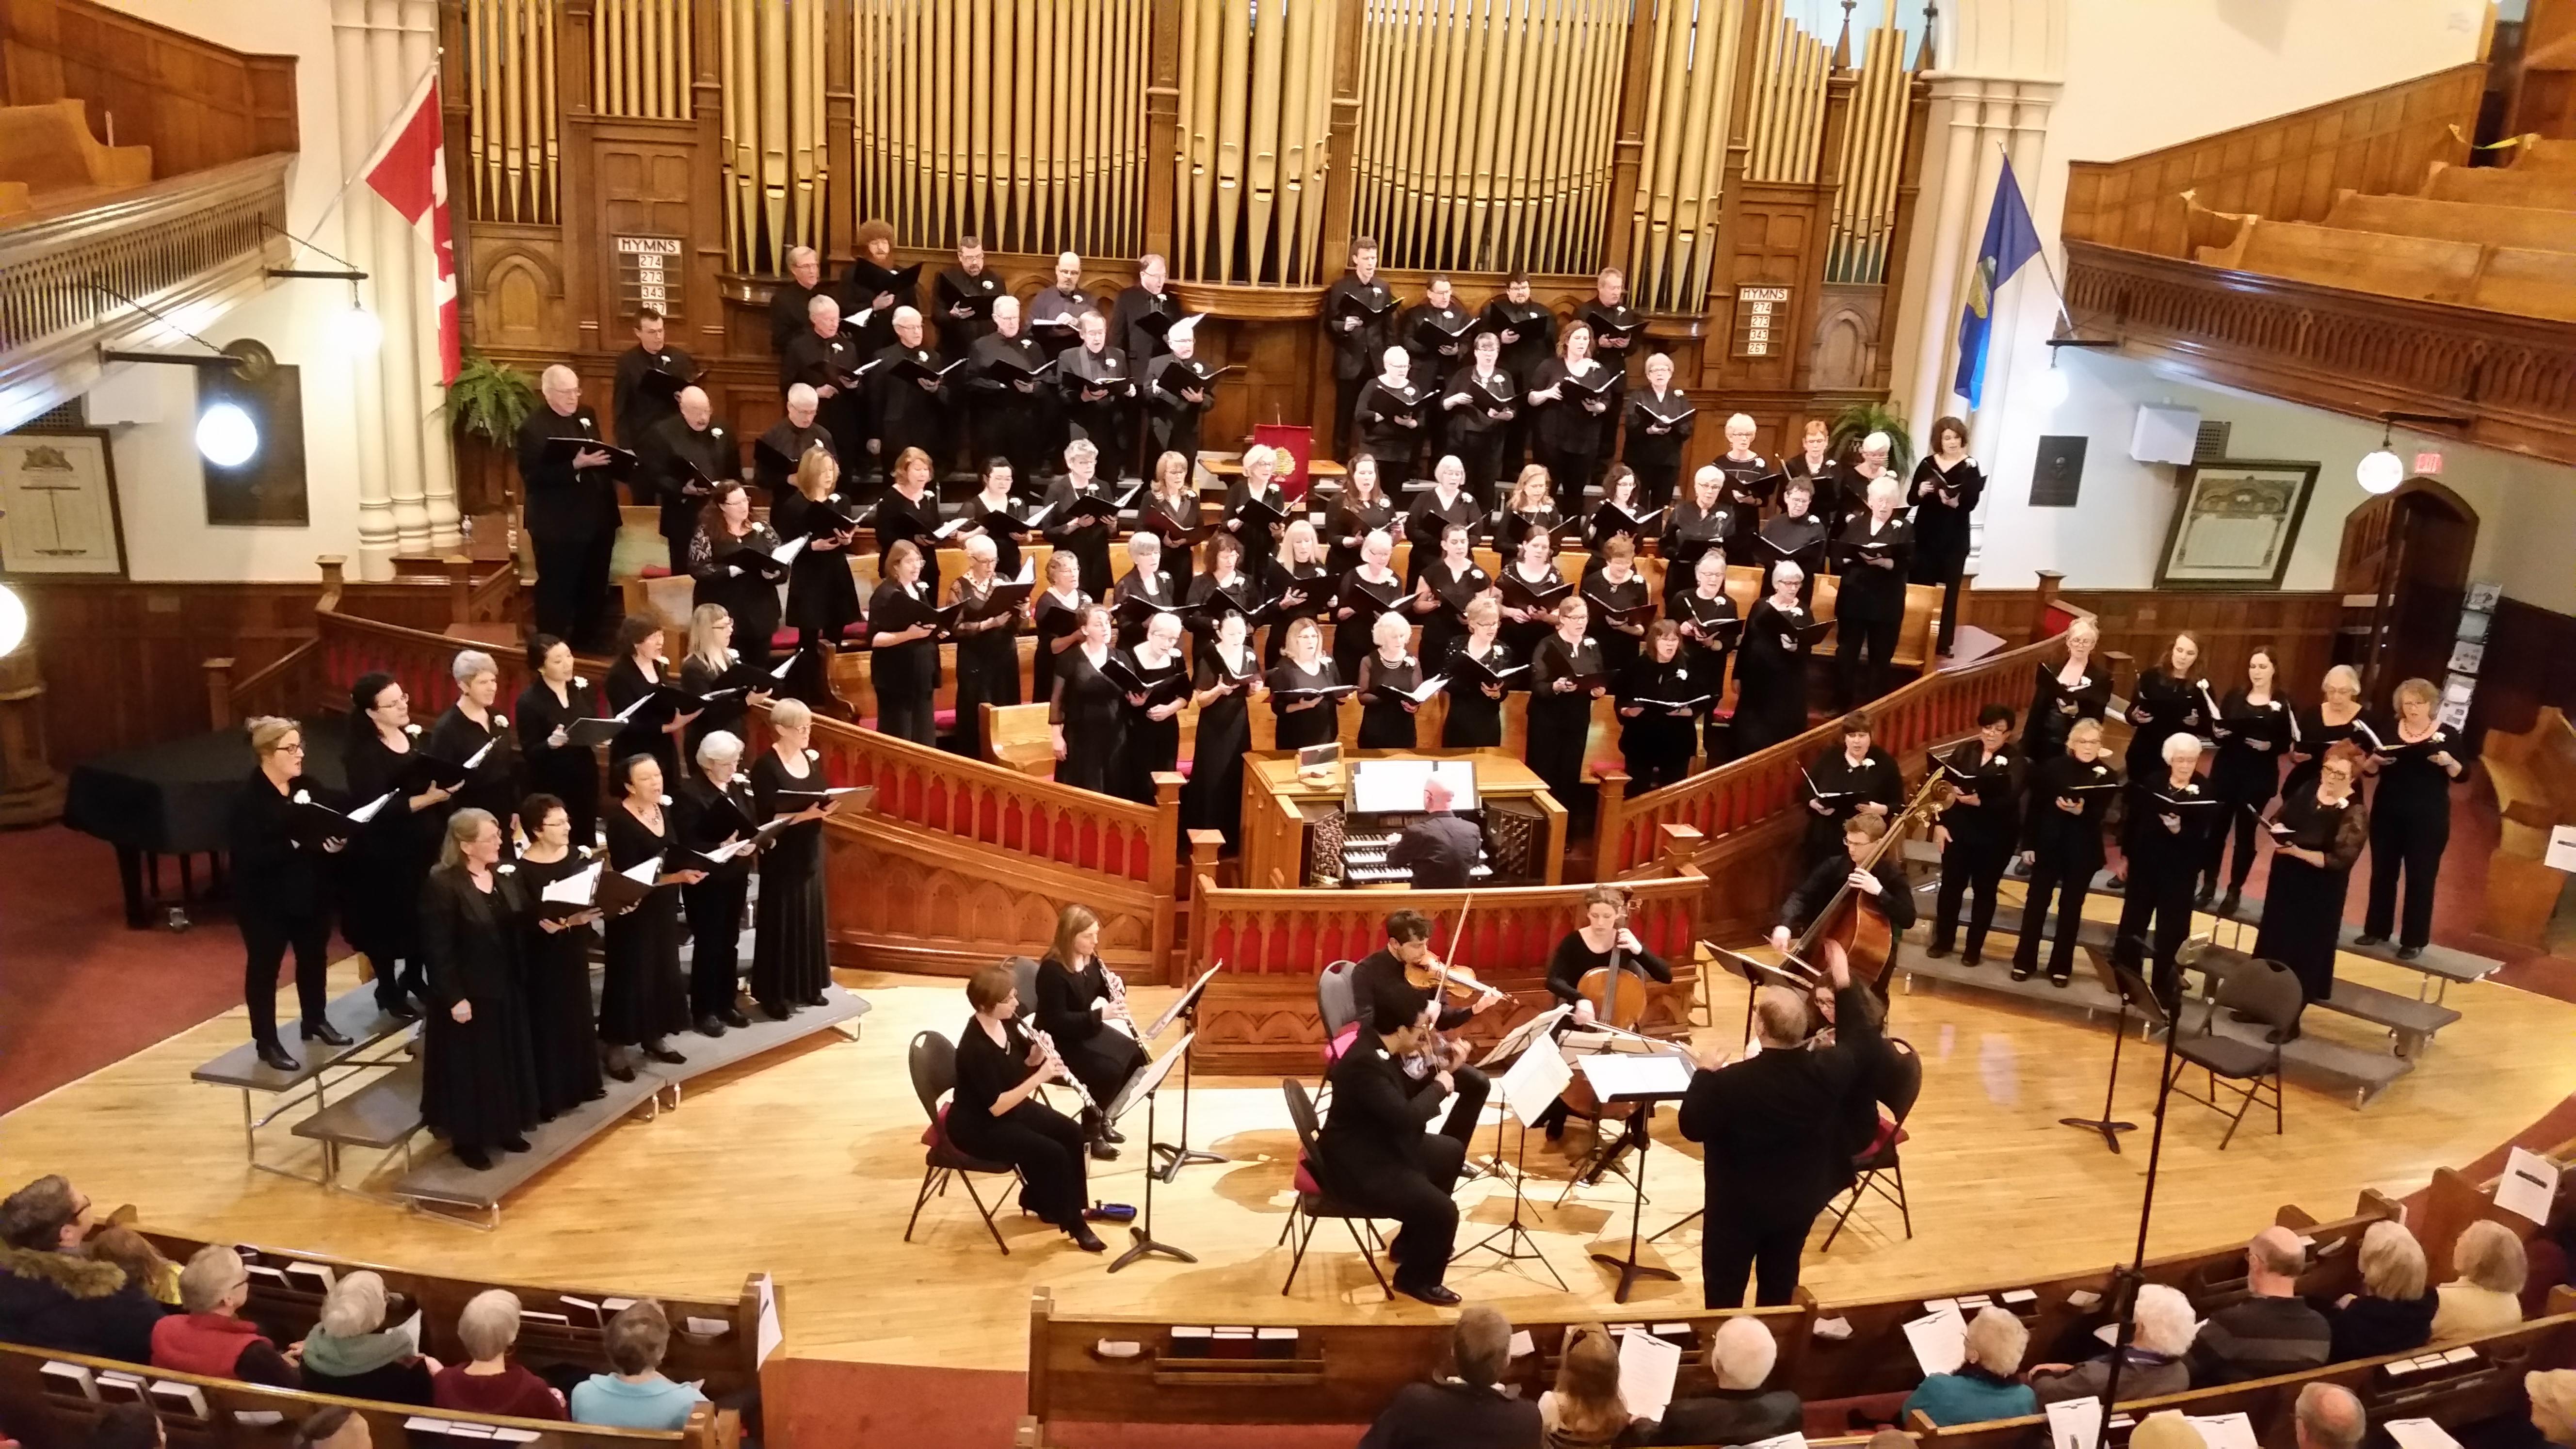 Sing Spirit: The Heart of Handel